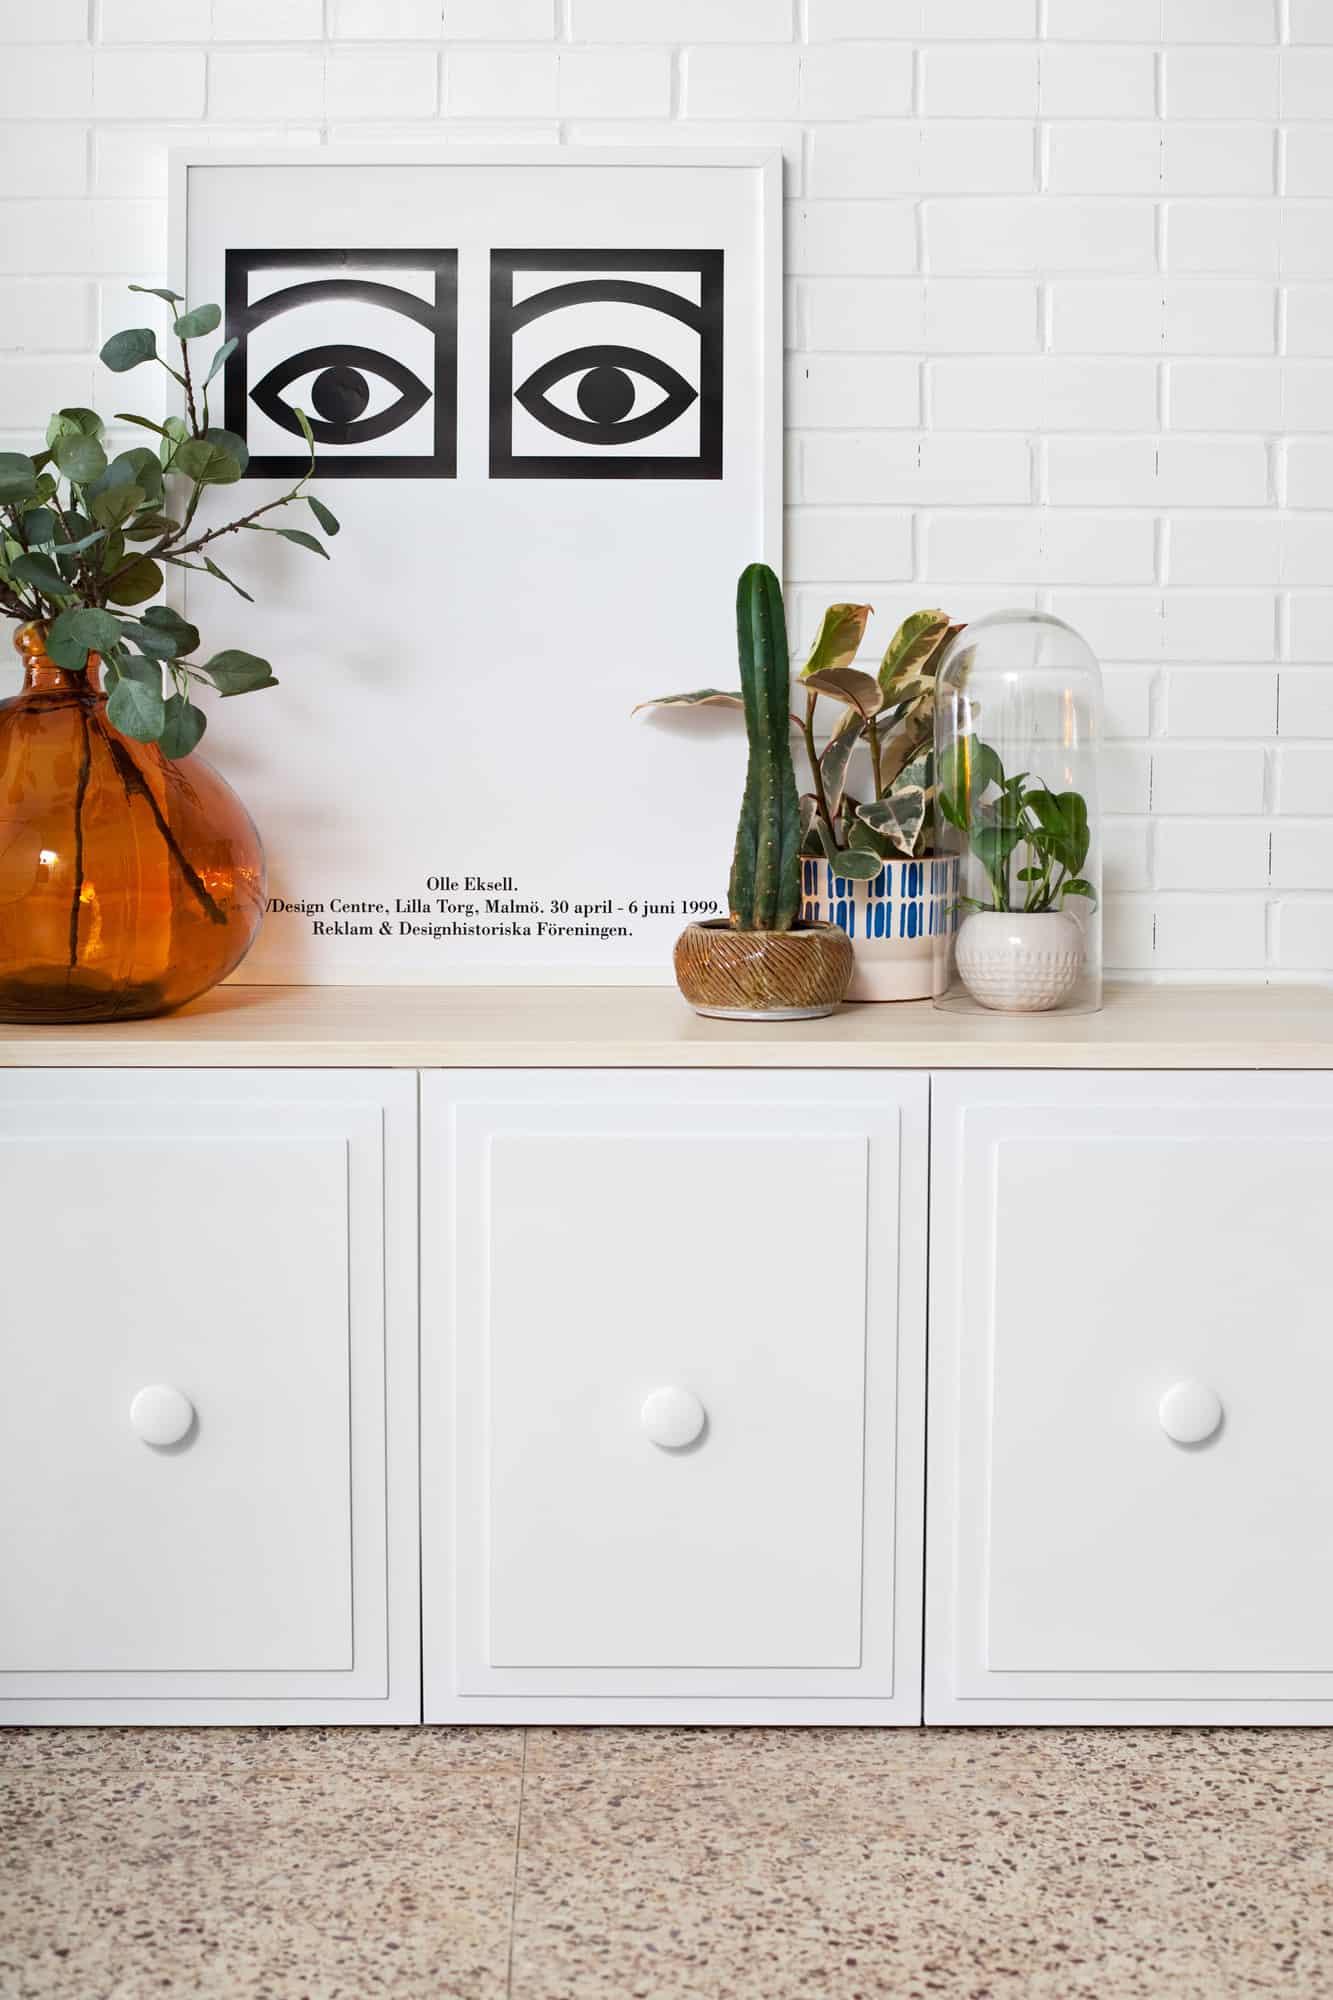 Ikea Restyle Modern Hollywood Regency, Ikea Living Room Storage Cabinets Sideboards